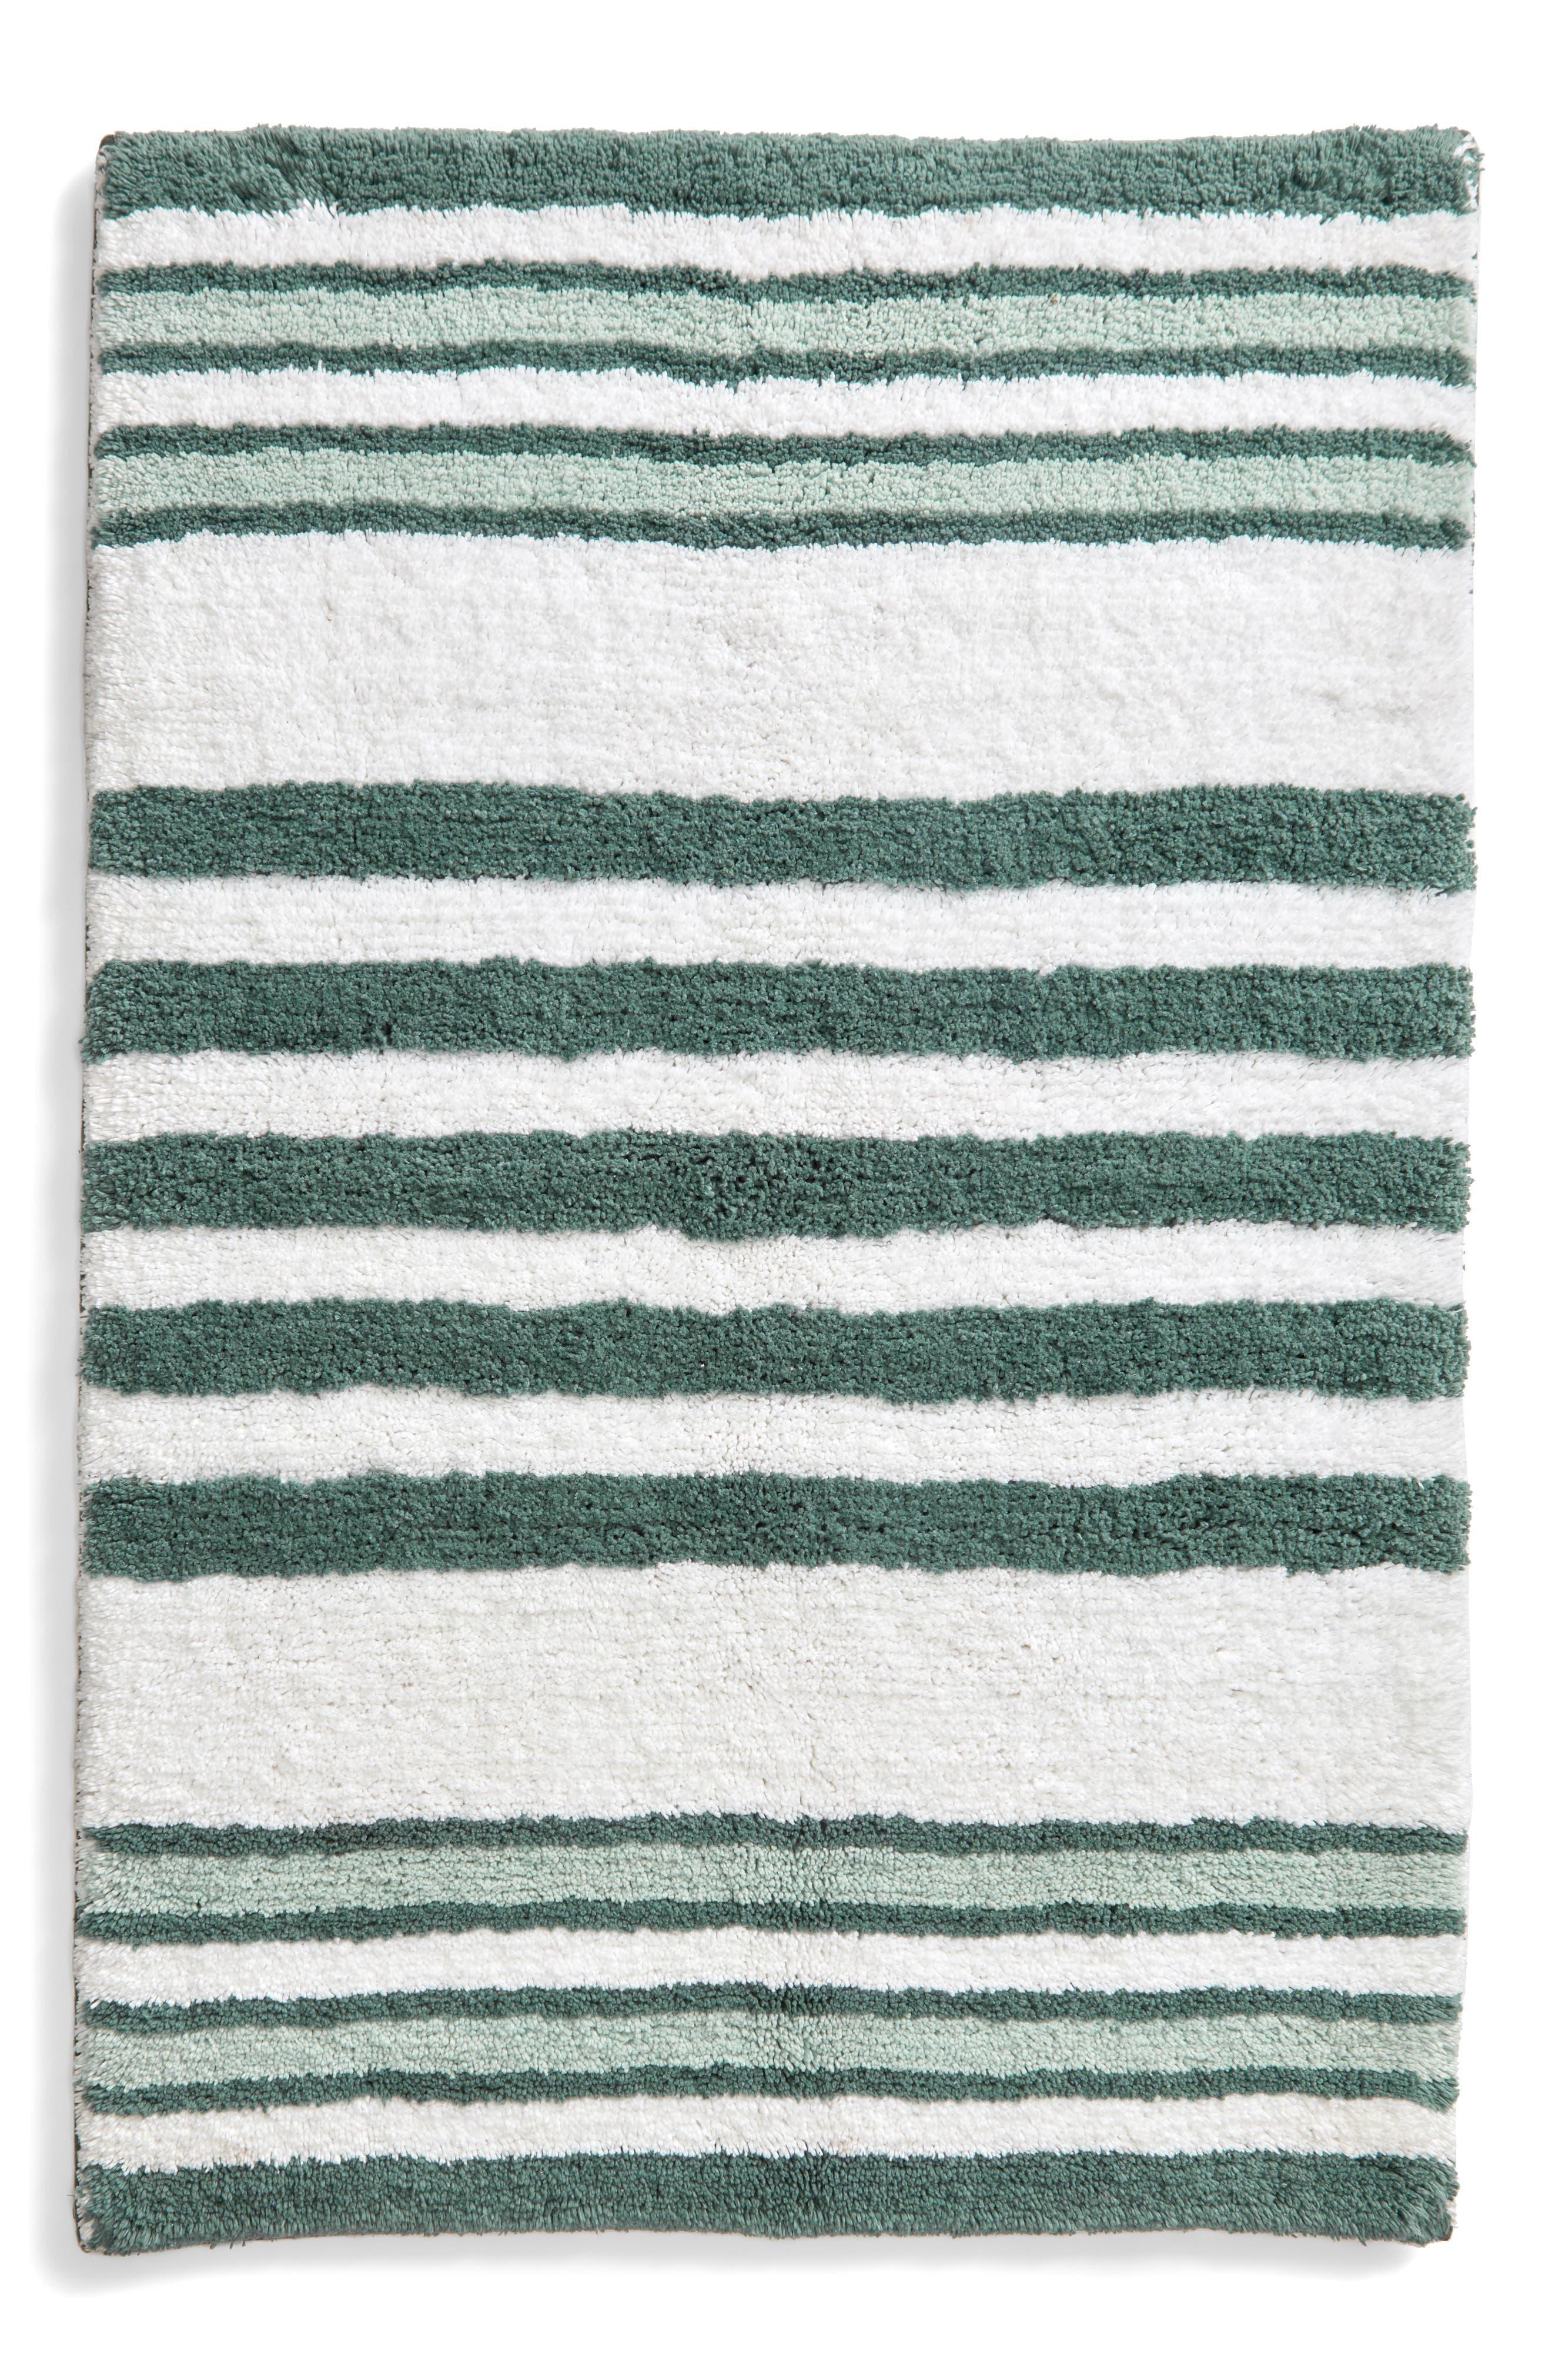 NORDSTROM AT HOME,                             Stripe Bath Rug,                             Main thumbnail 1, color,                             TEAL TITANIC